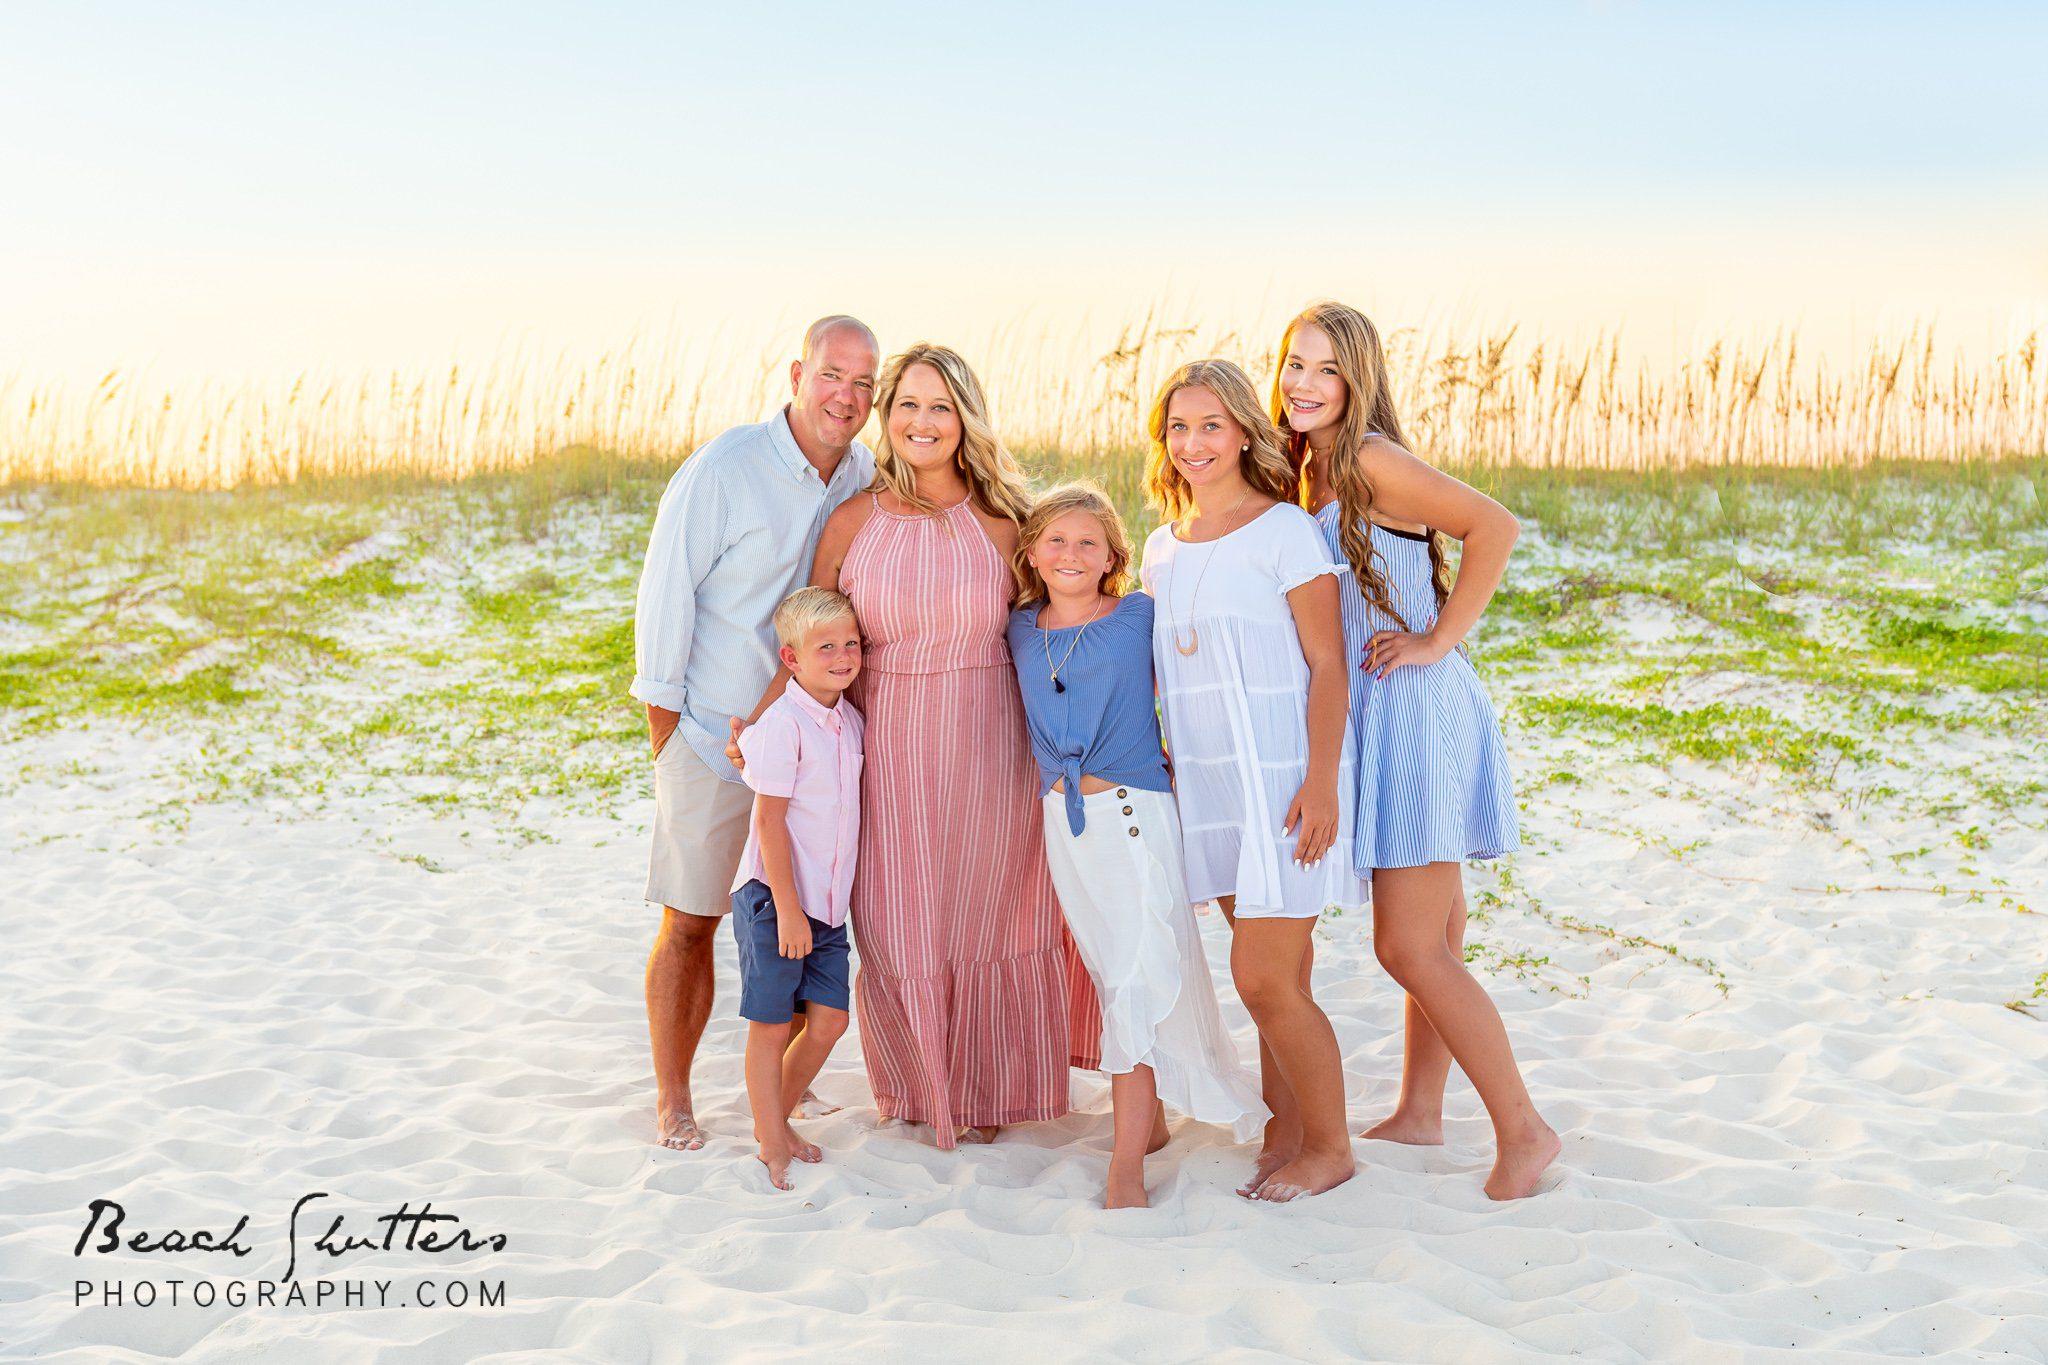 beach photos in Alabama